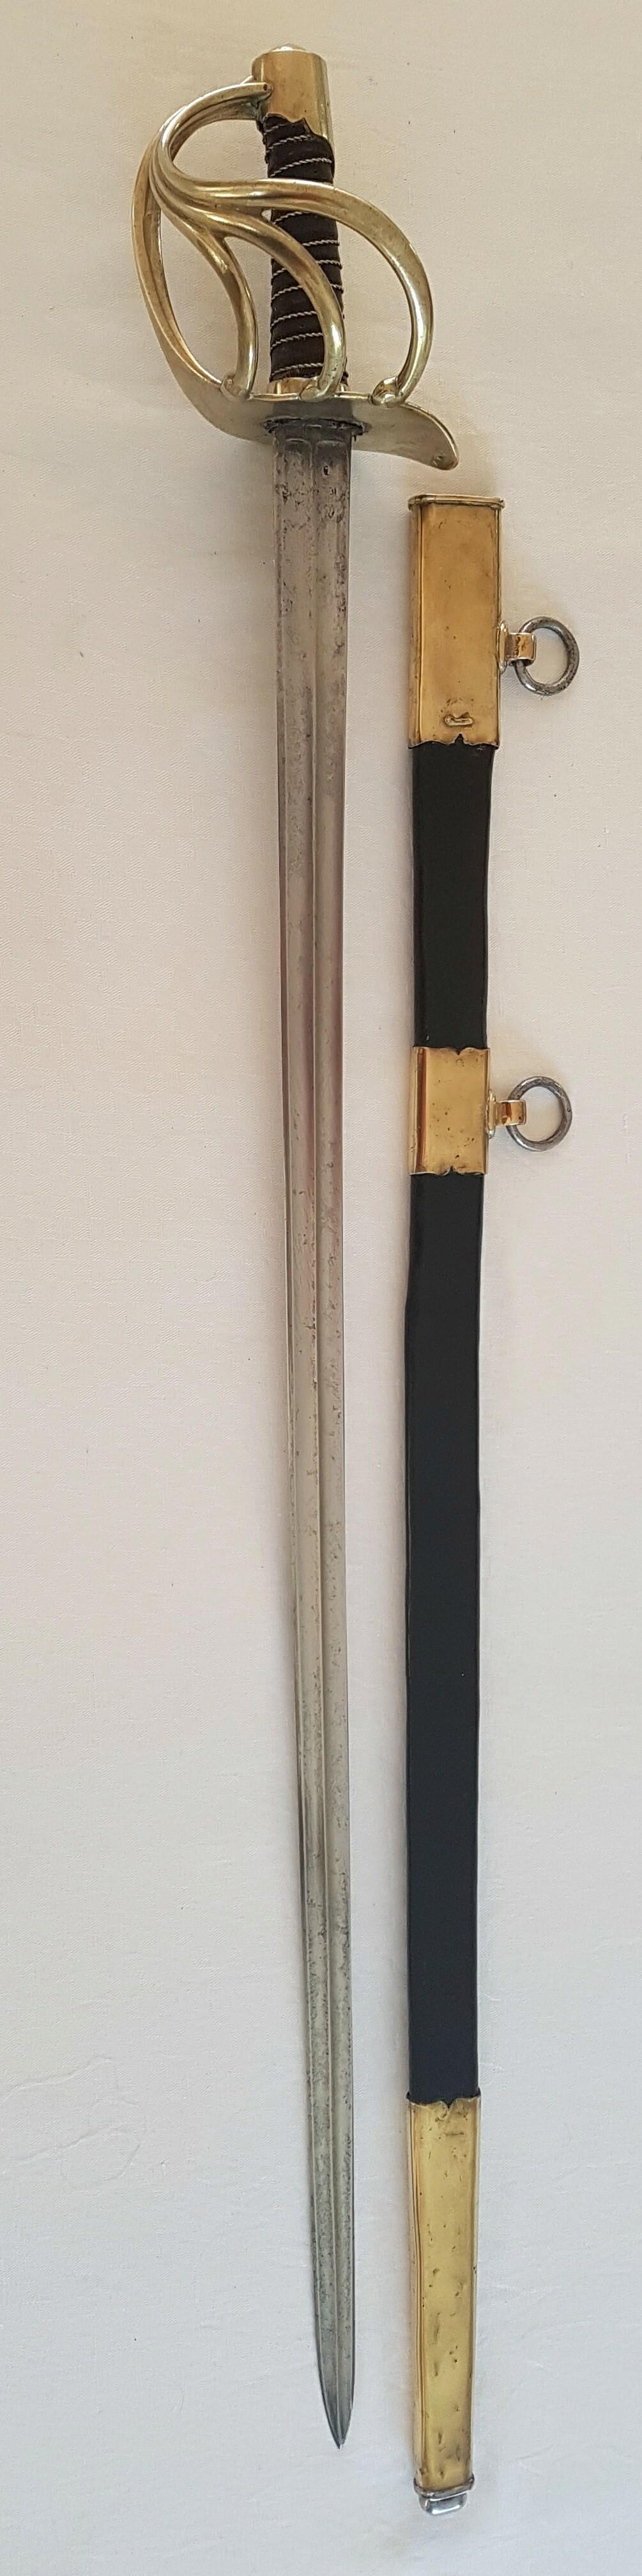 Identification sabre dragon 1812 1019